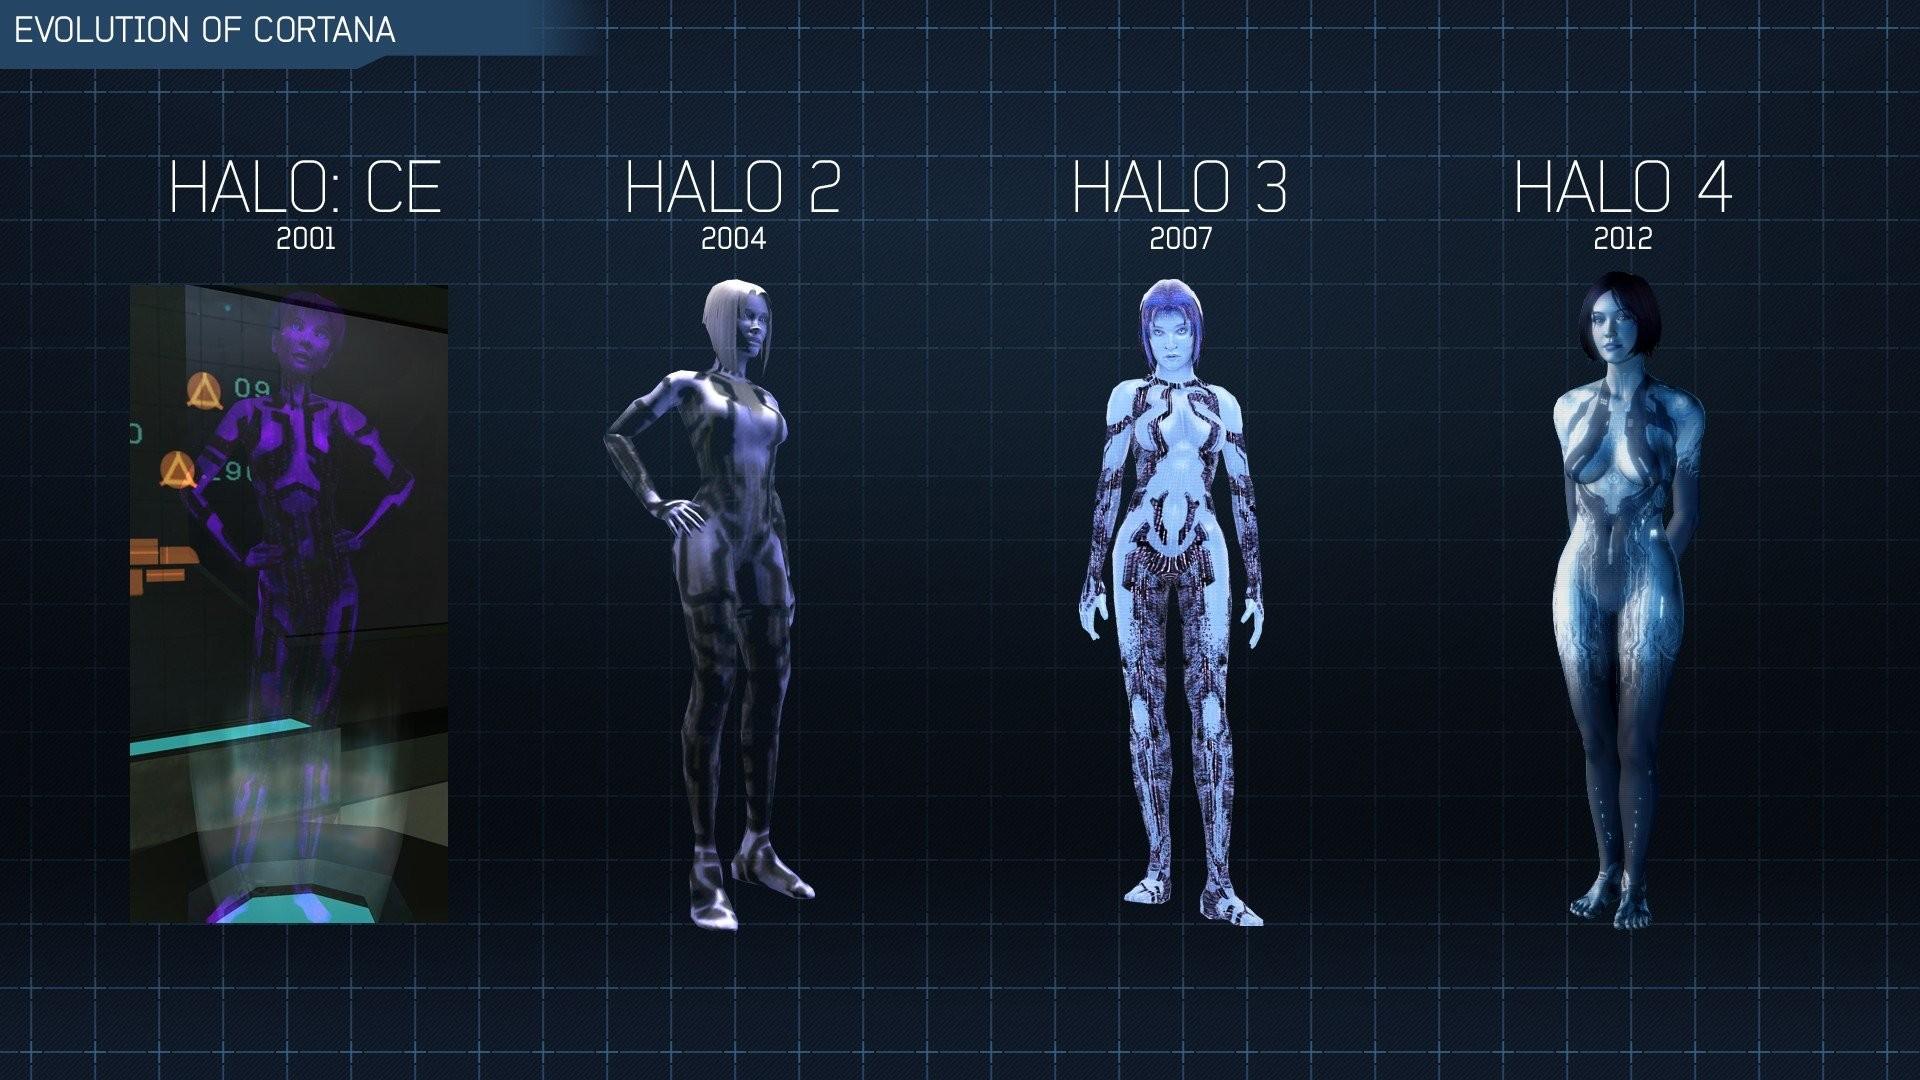 Video games Cortana Halo evolution Halo 4 Halo 2 wallpaper | .